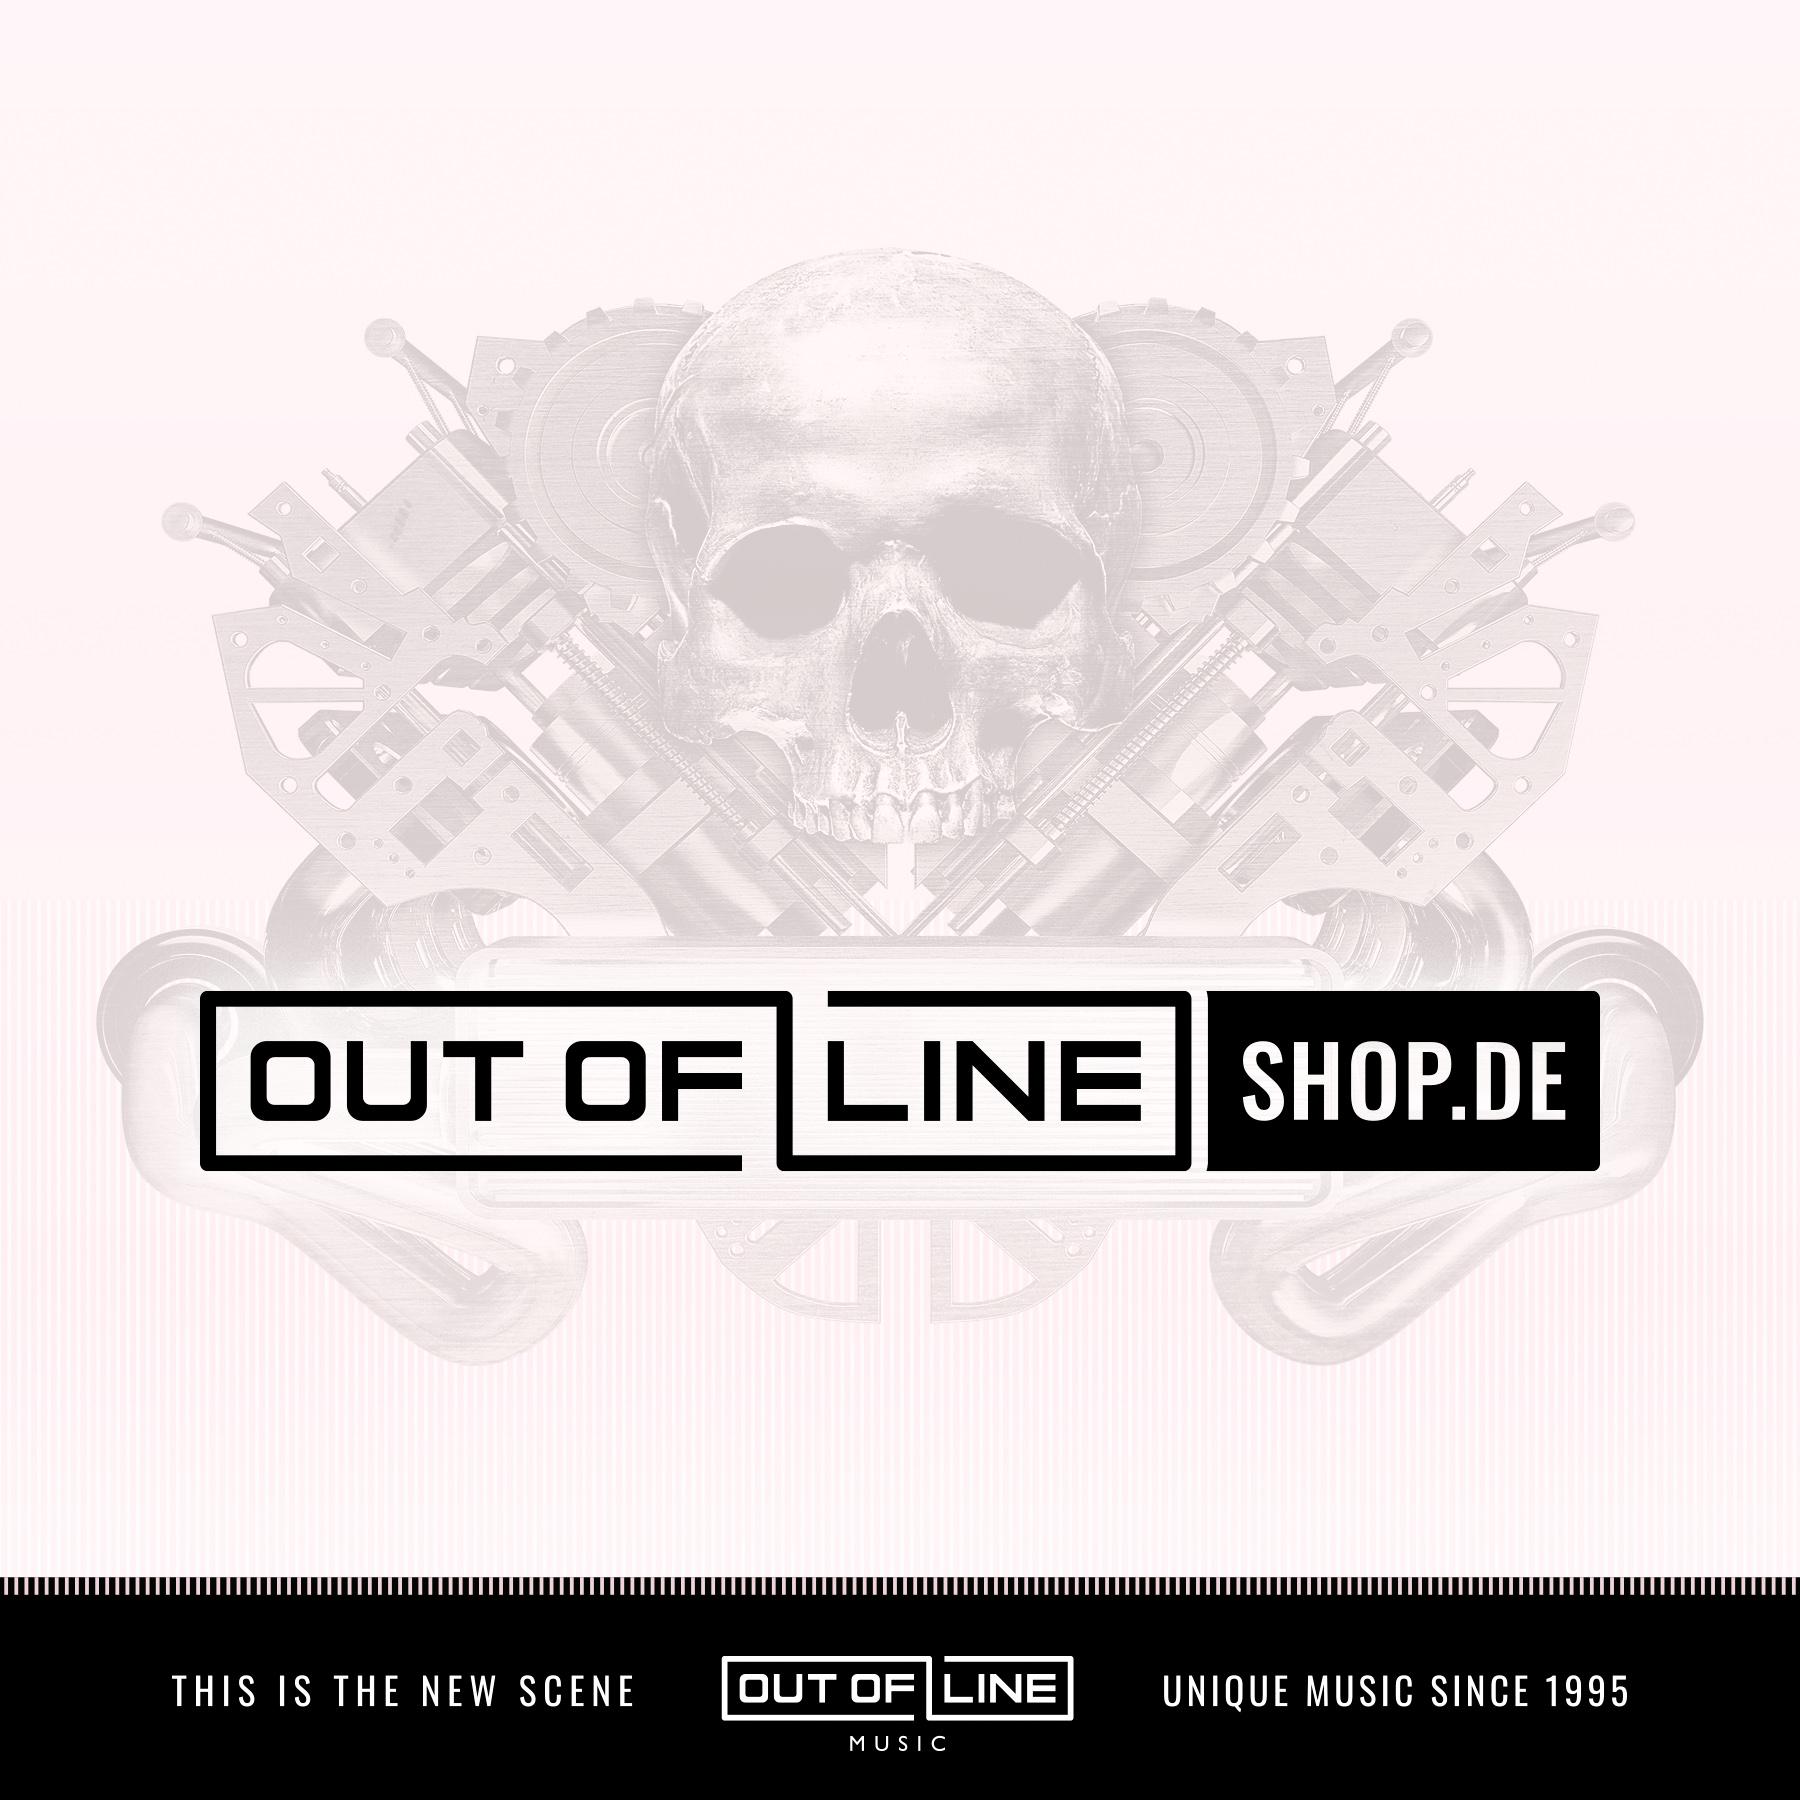 Solar Fake - Enjoy Dystopia (Limited Colored Vinyl) - 2LP